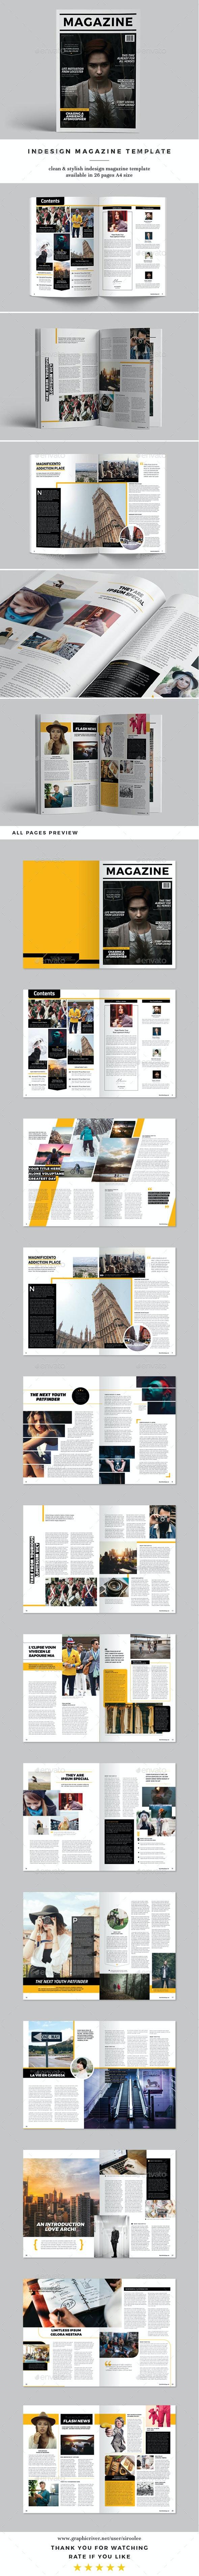 InDesign Magazine Vol.3 - Magazines Print Templates